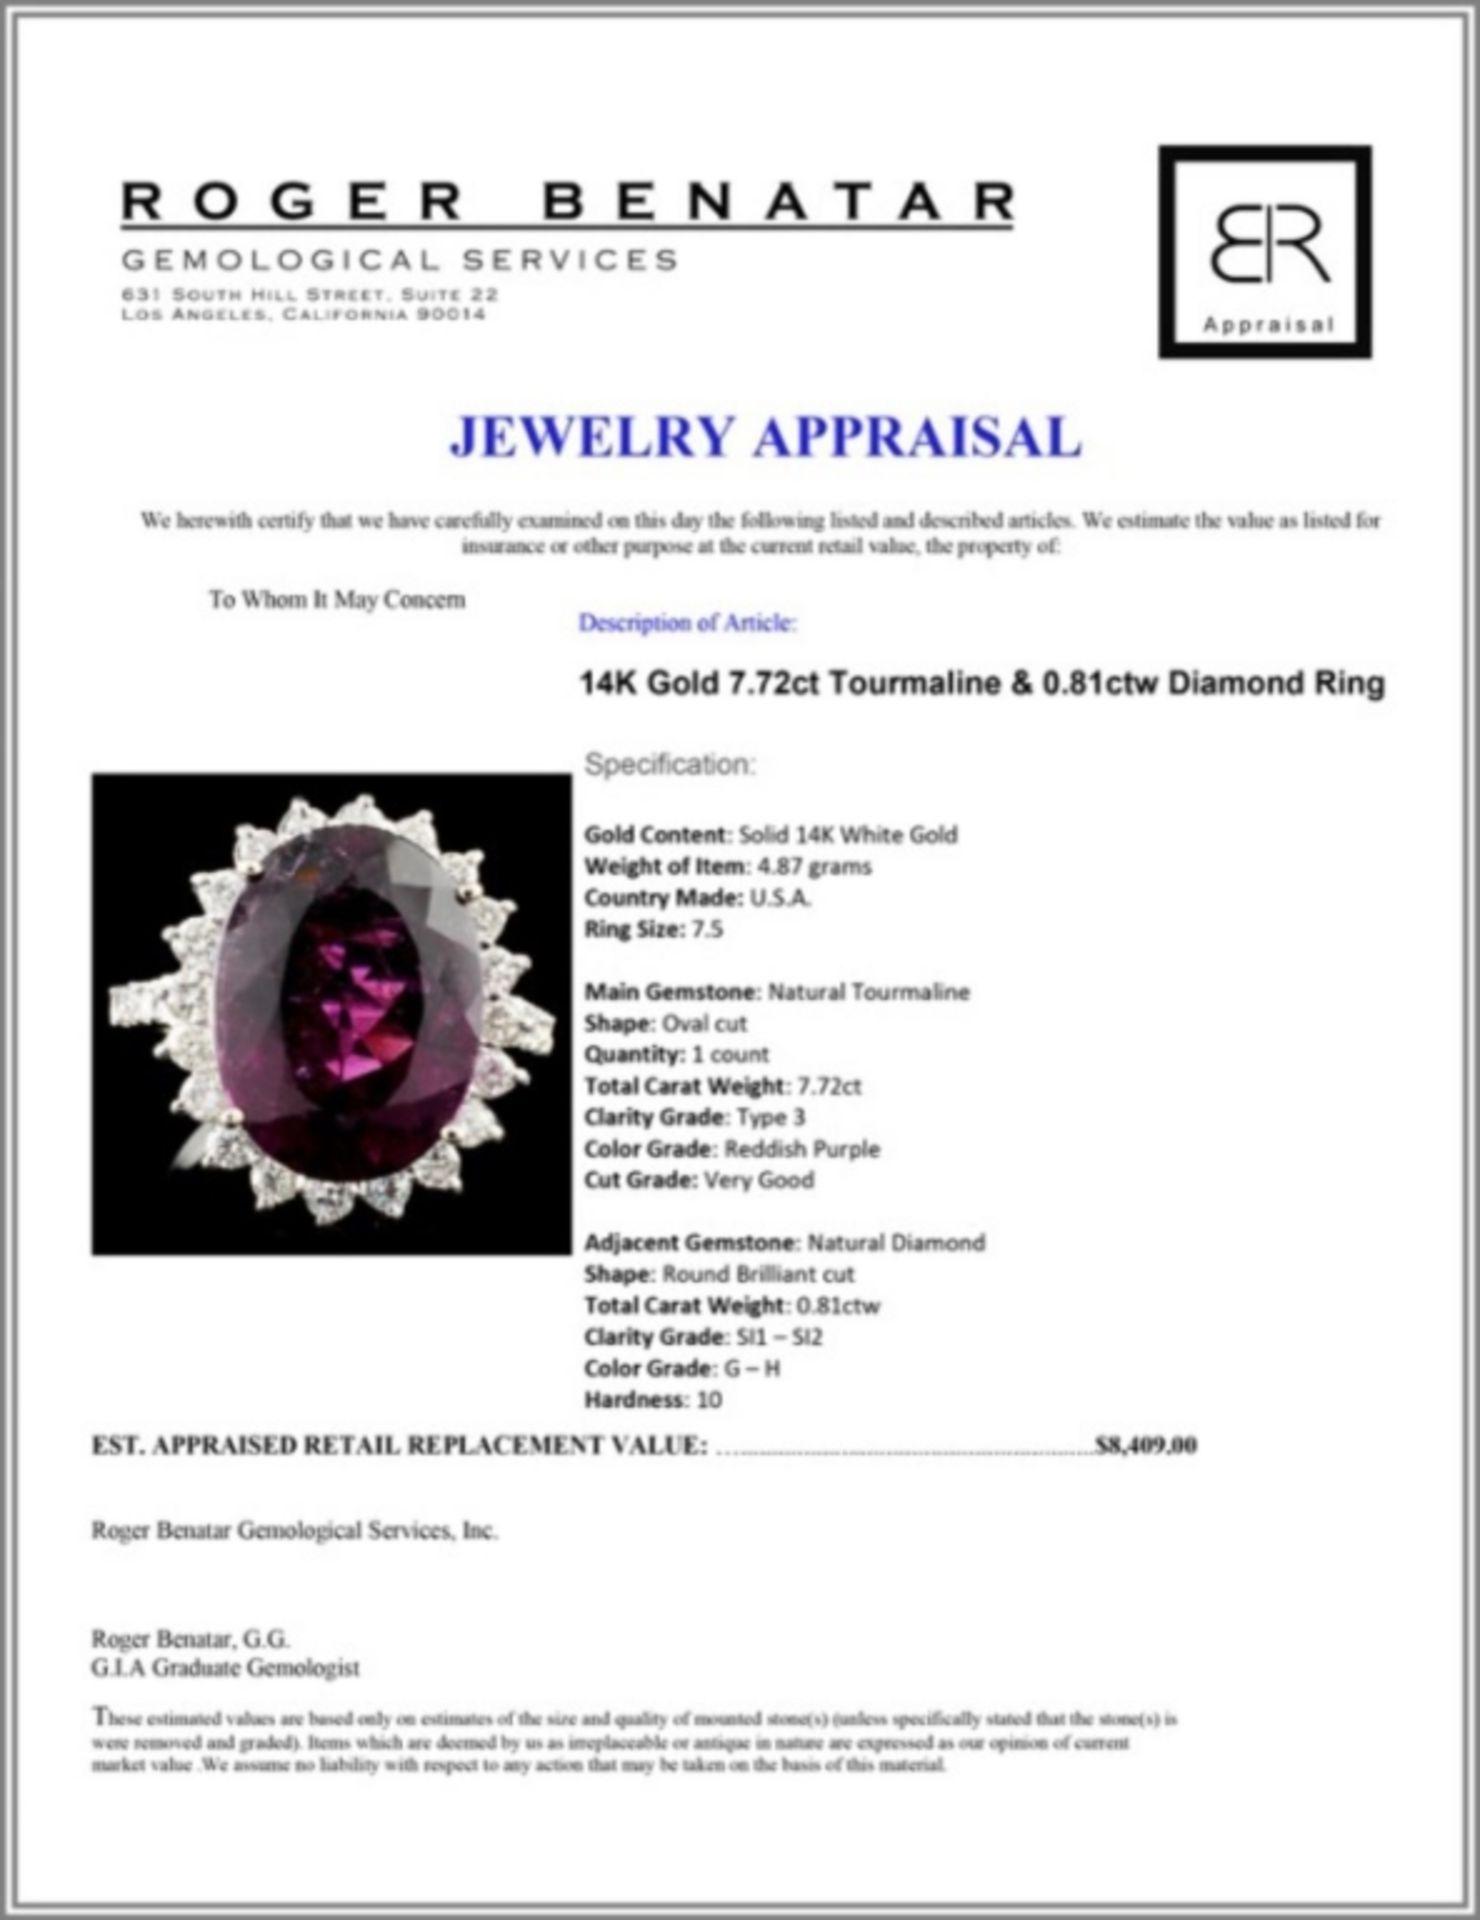 14K Gold 7.72ct Tourmaline & 0.81ctw Diamond Ring - Image 4 of 4